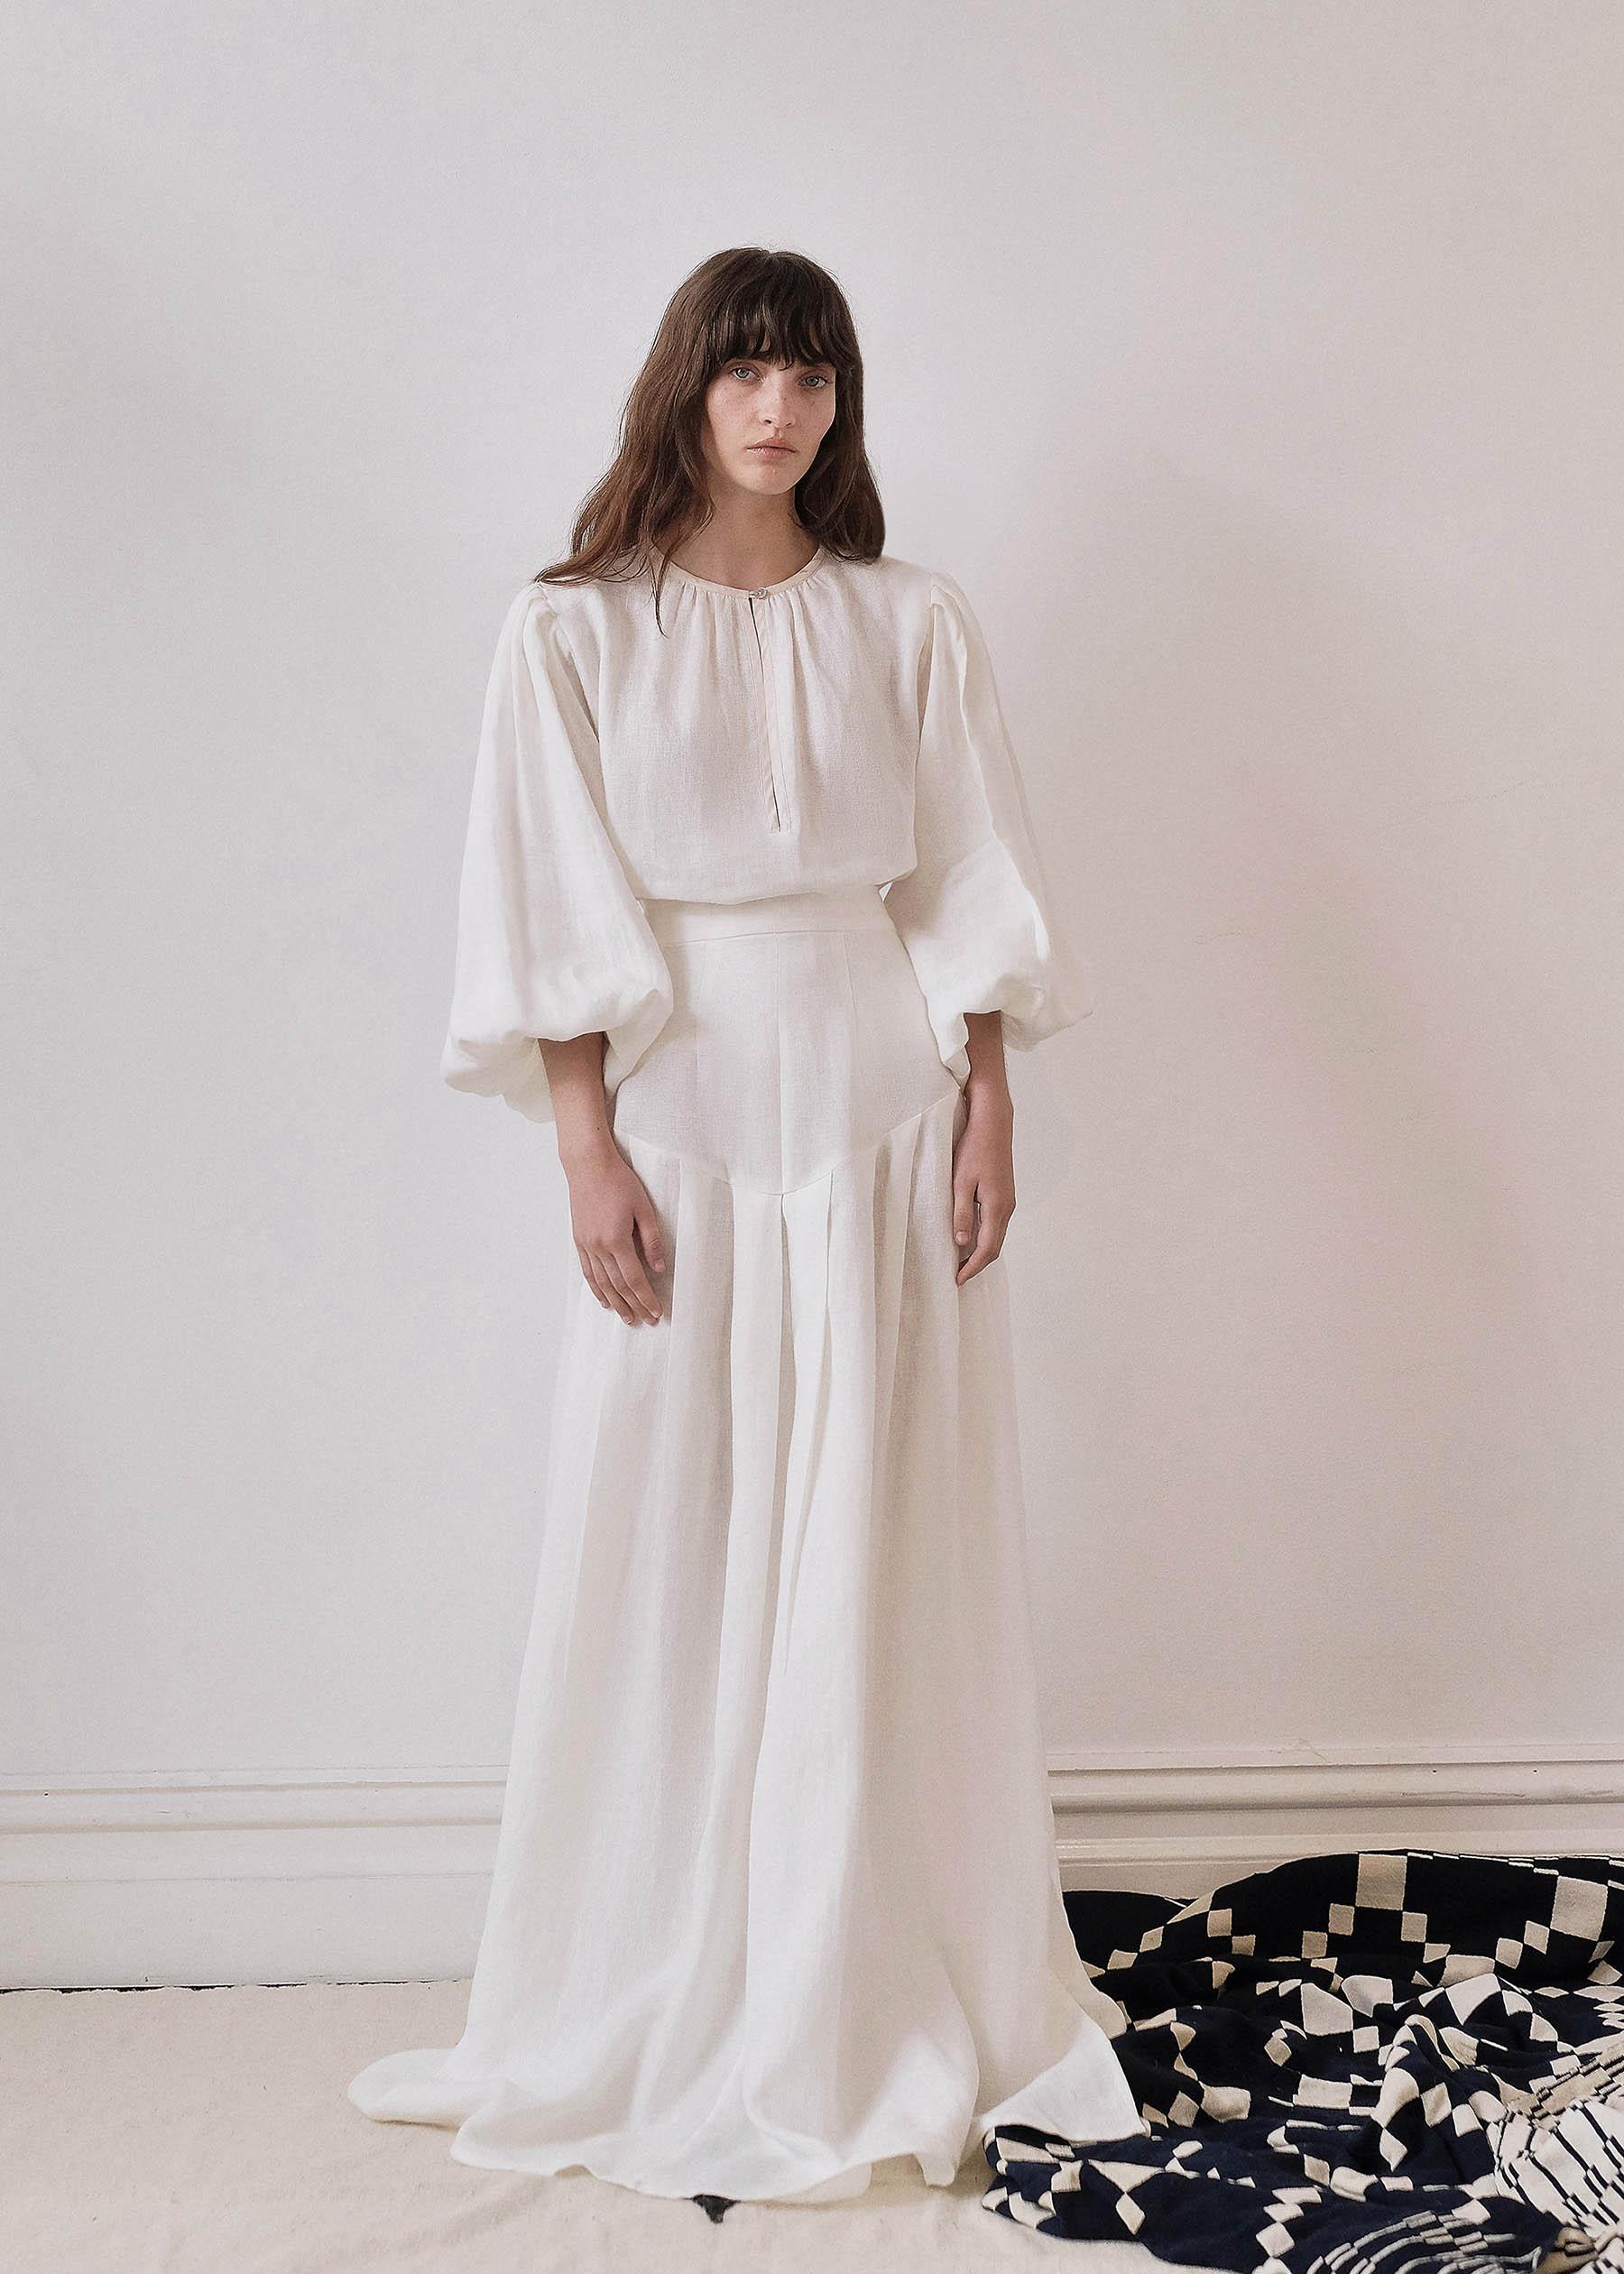 SARAH JANE CLARKE_Russi Skirt_No Frill_White_6 copy.jpg